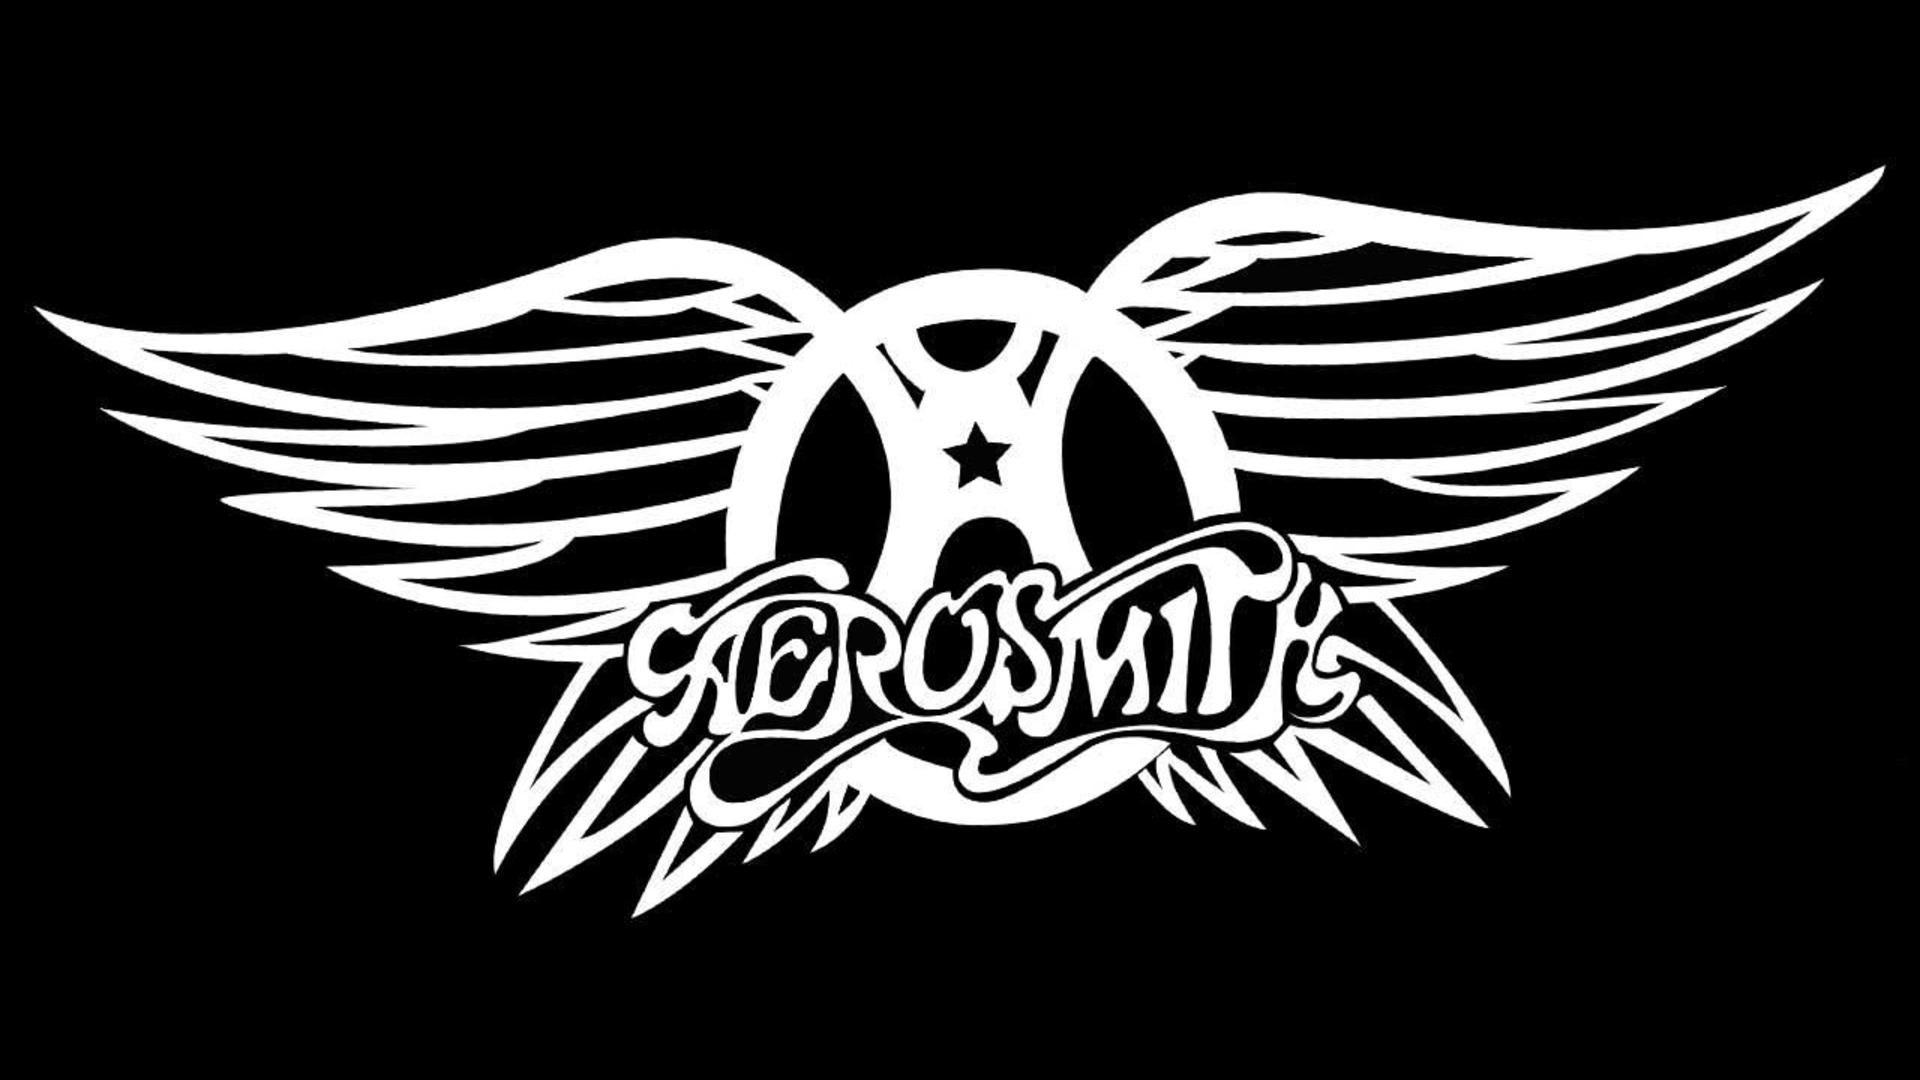 Download Wallpaper 1920x1080 Aerosmith Logo Symbol Text Wings Full Hd 1080p Hd Background Rock Band Logos Aerosmith Rock Bands